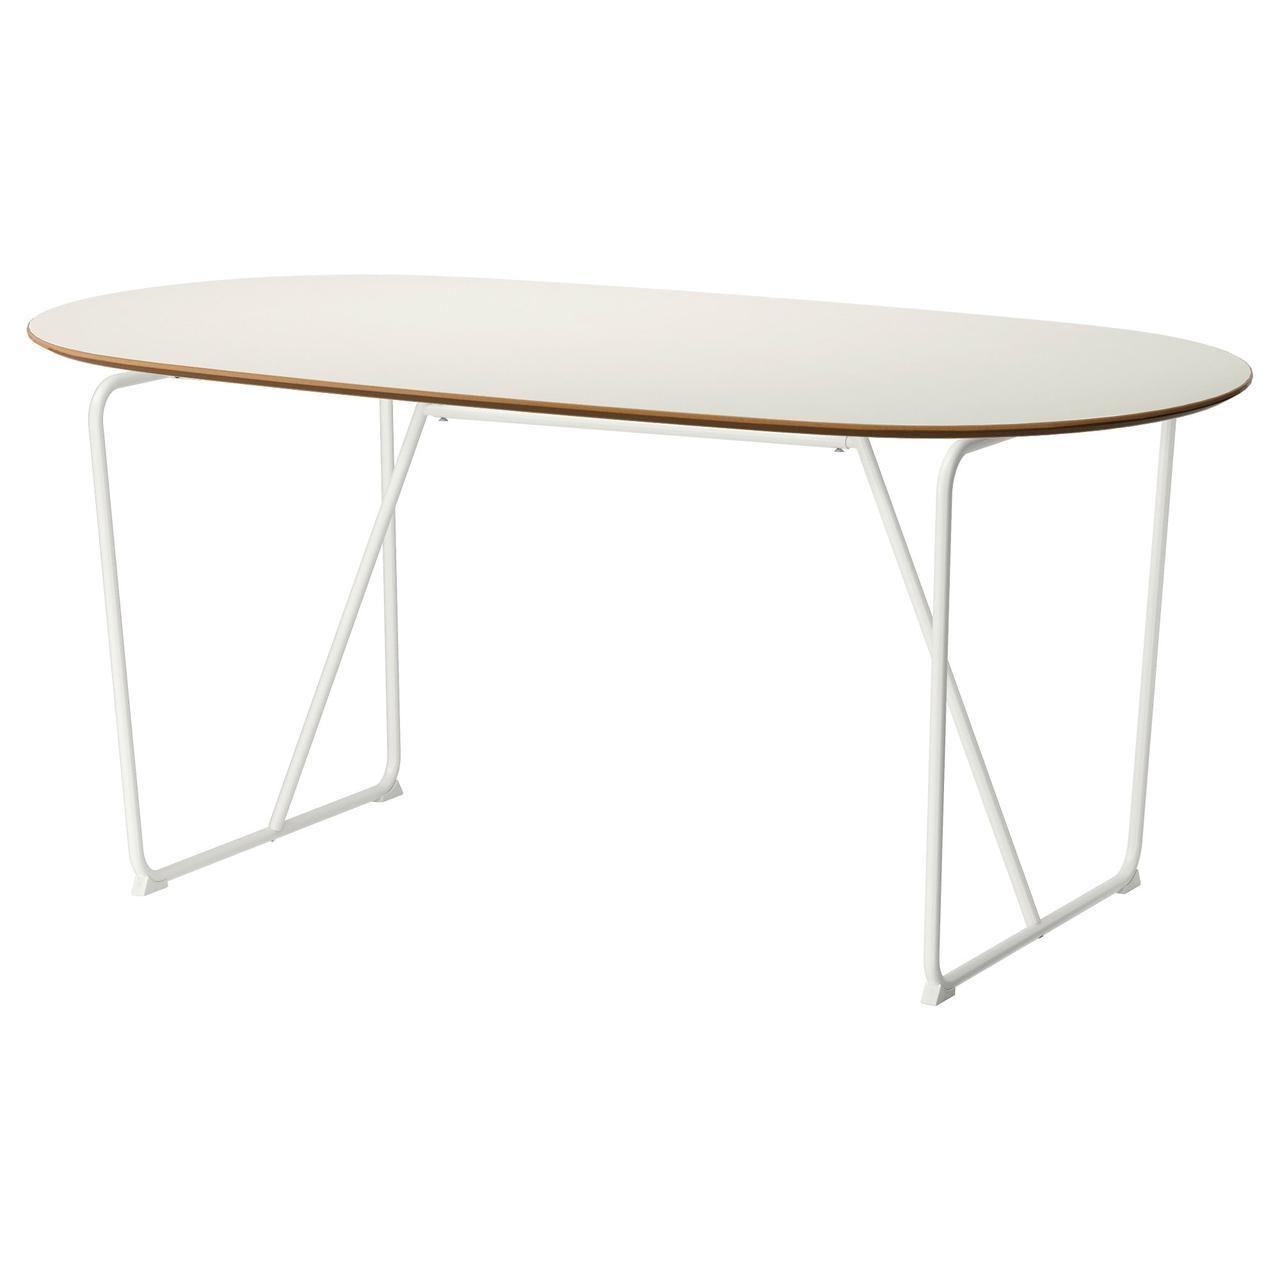 IKEA SLAHULT (791.406.96) Стол, белая береза, белая берёза Дальшют